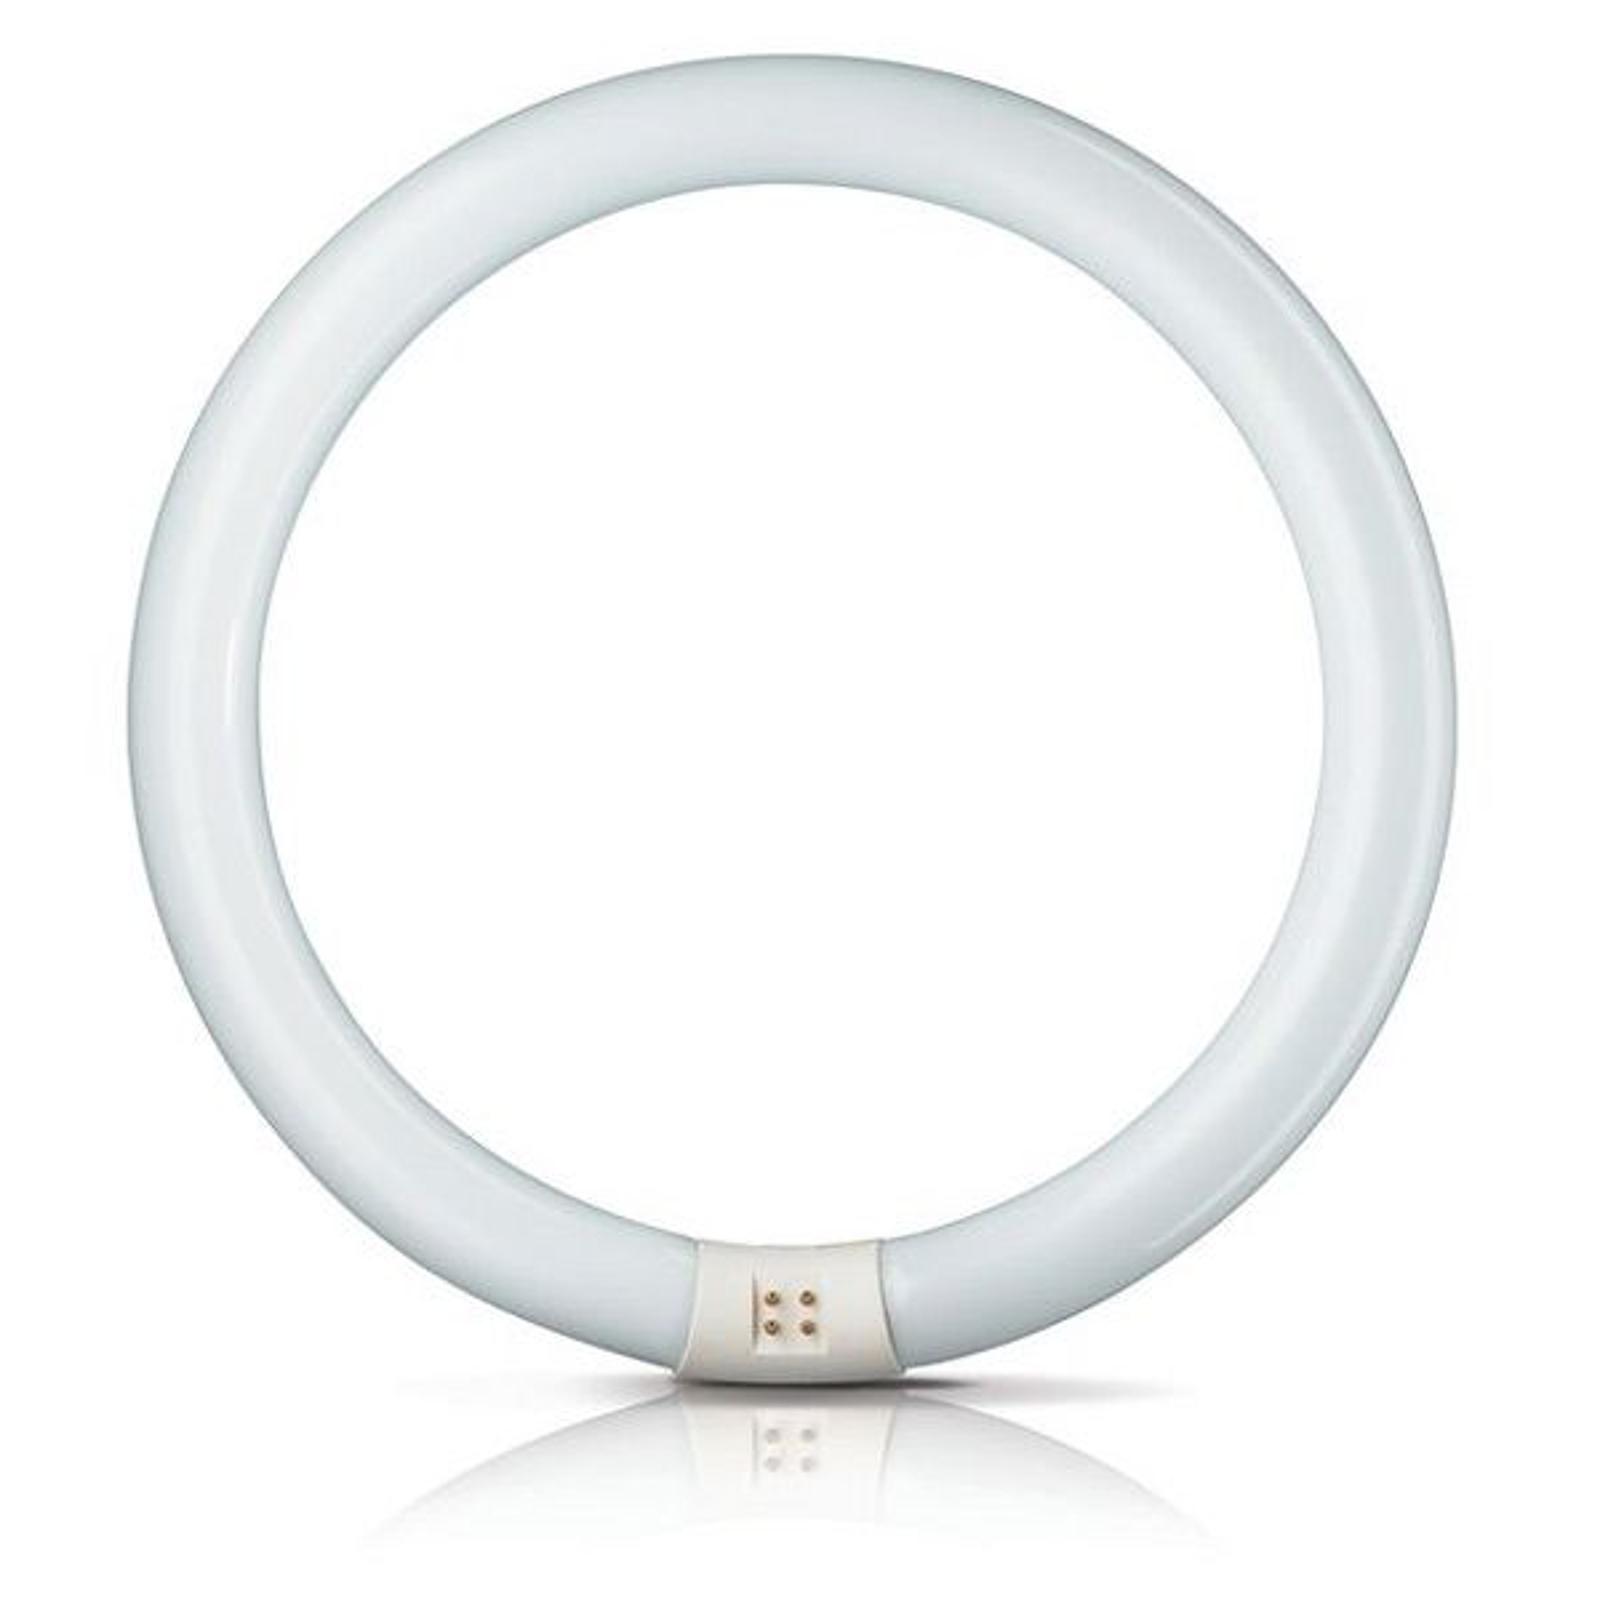 G10q 32W 865 Leuchtstoffring Master Circular TL-E